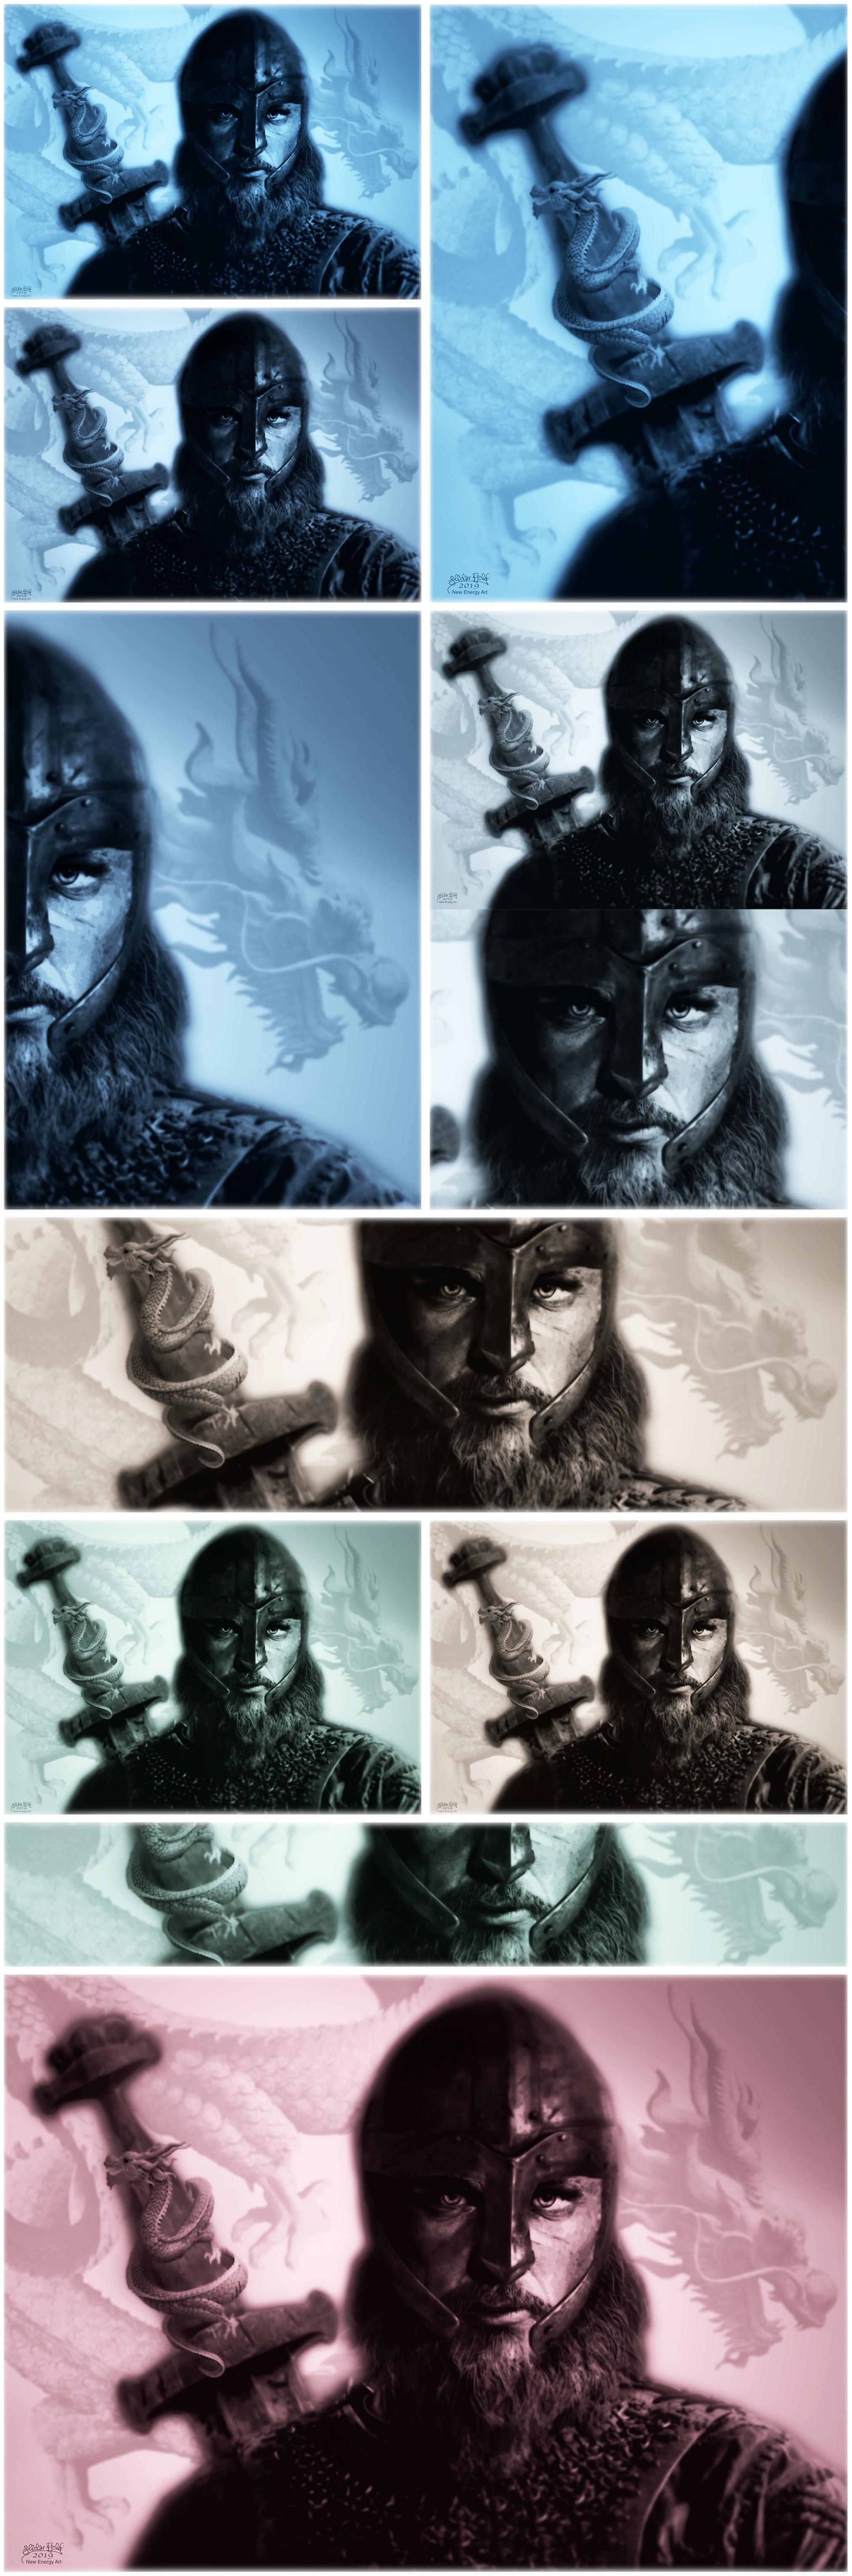 Viking Warrior DRAGON v6 COLLECTION 2019